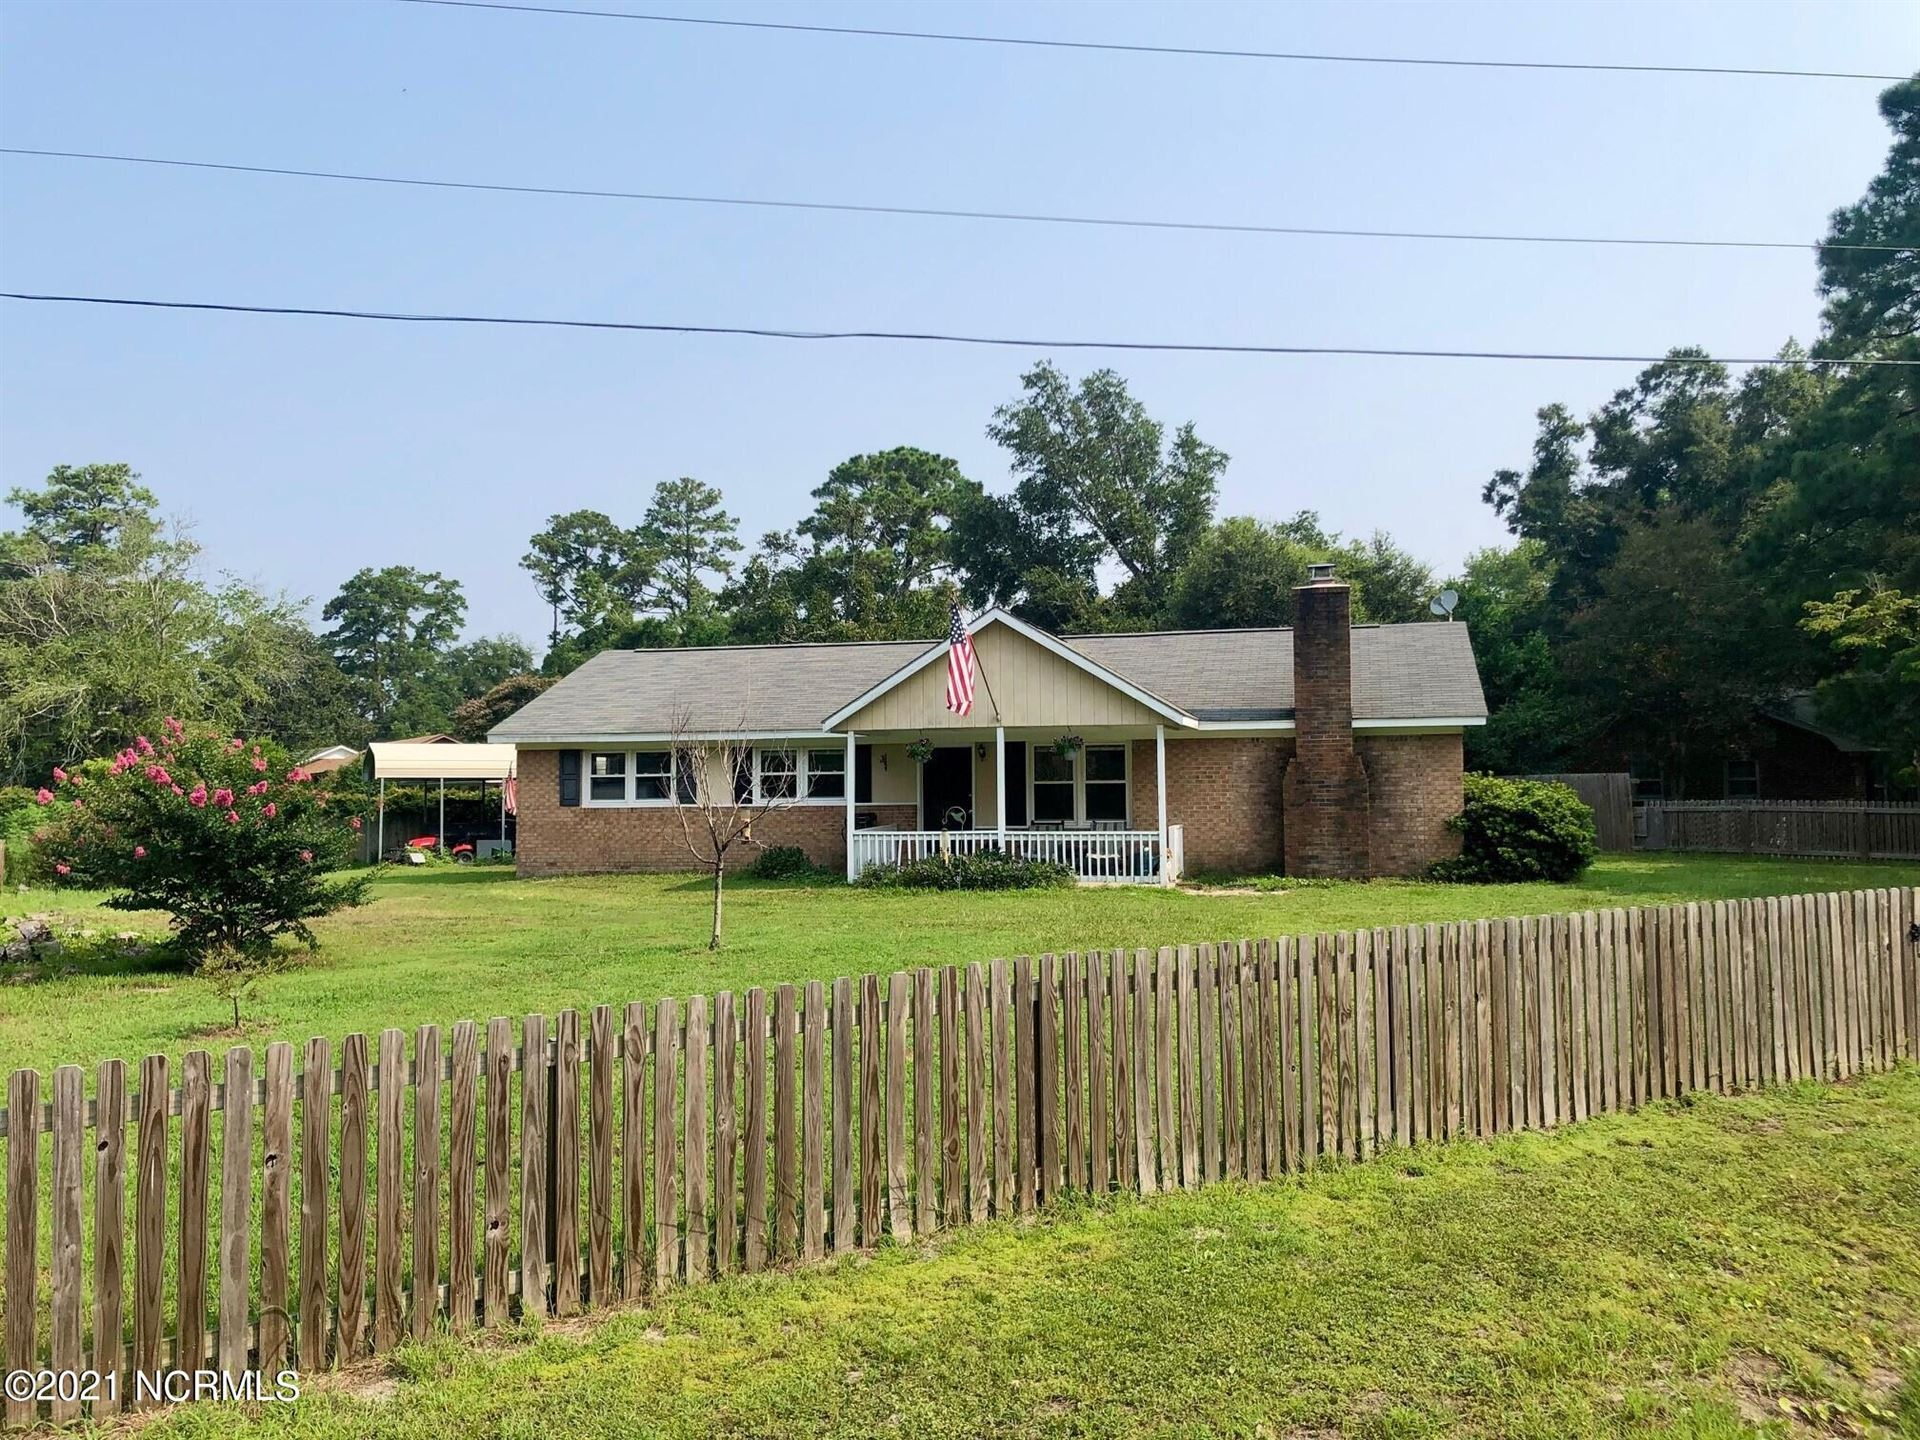 Photo for 166 Homestead Court, Wilmington, NC 28411 (MLS # 100282020)